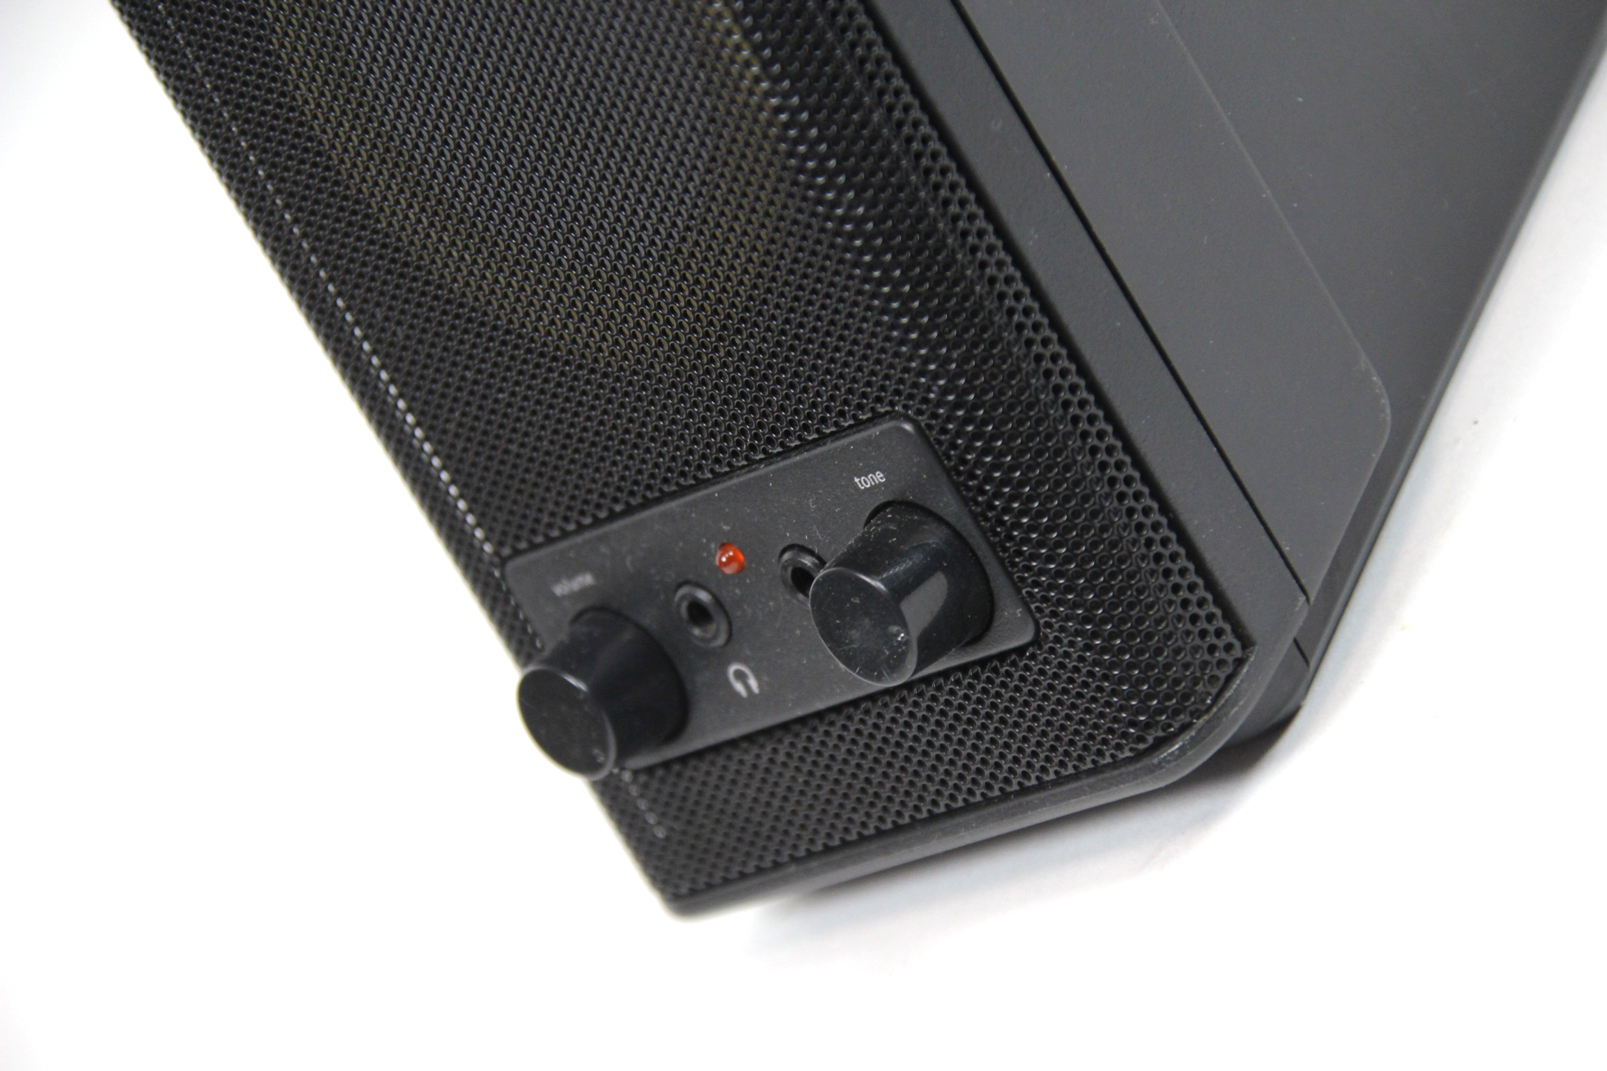 logitech s 0264b pc lautsprechersystem 2 0 lautsprecher system boxen speaker. Black Bedroom Furniture Sets. Home Design Ideas